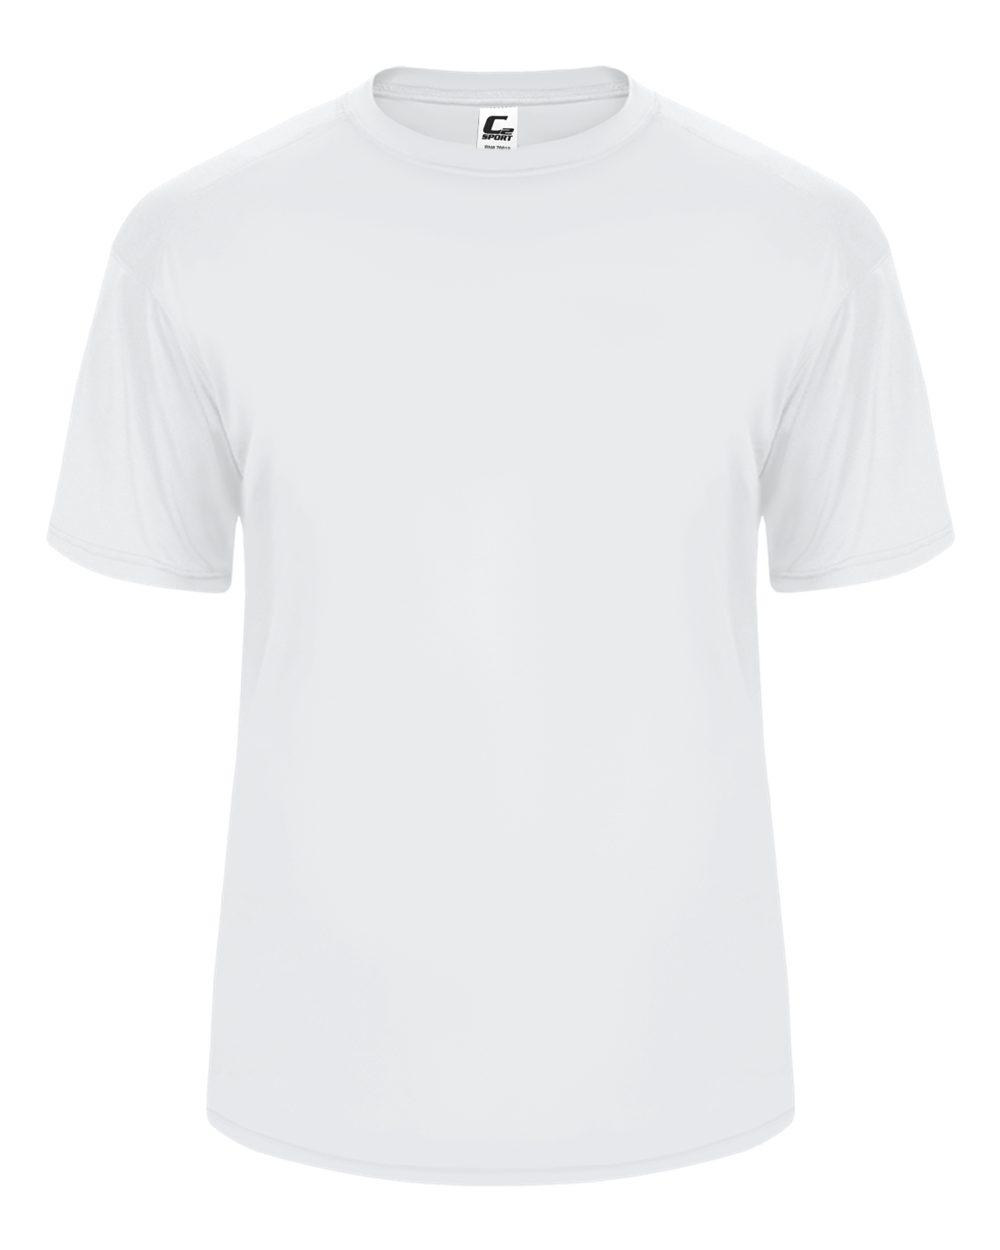 C2 Tee - White (005100WH)